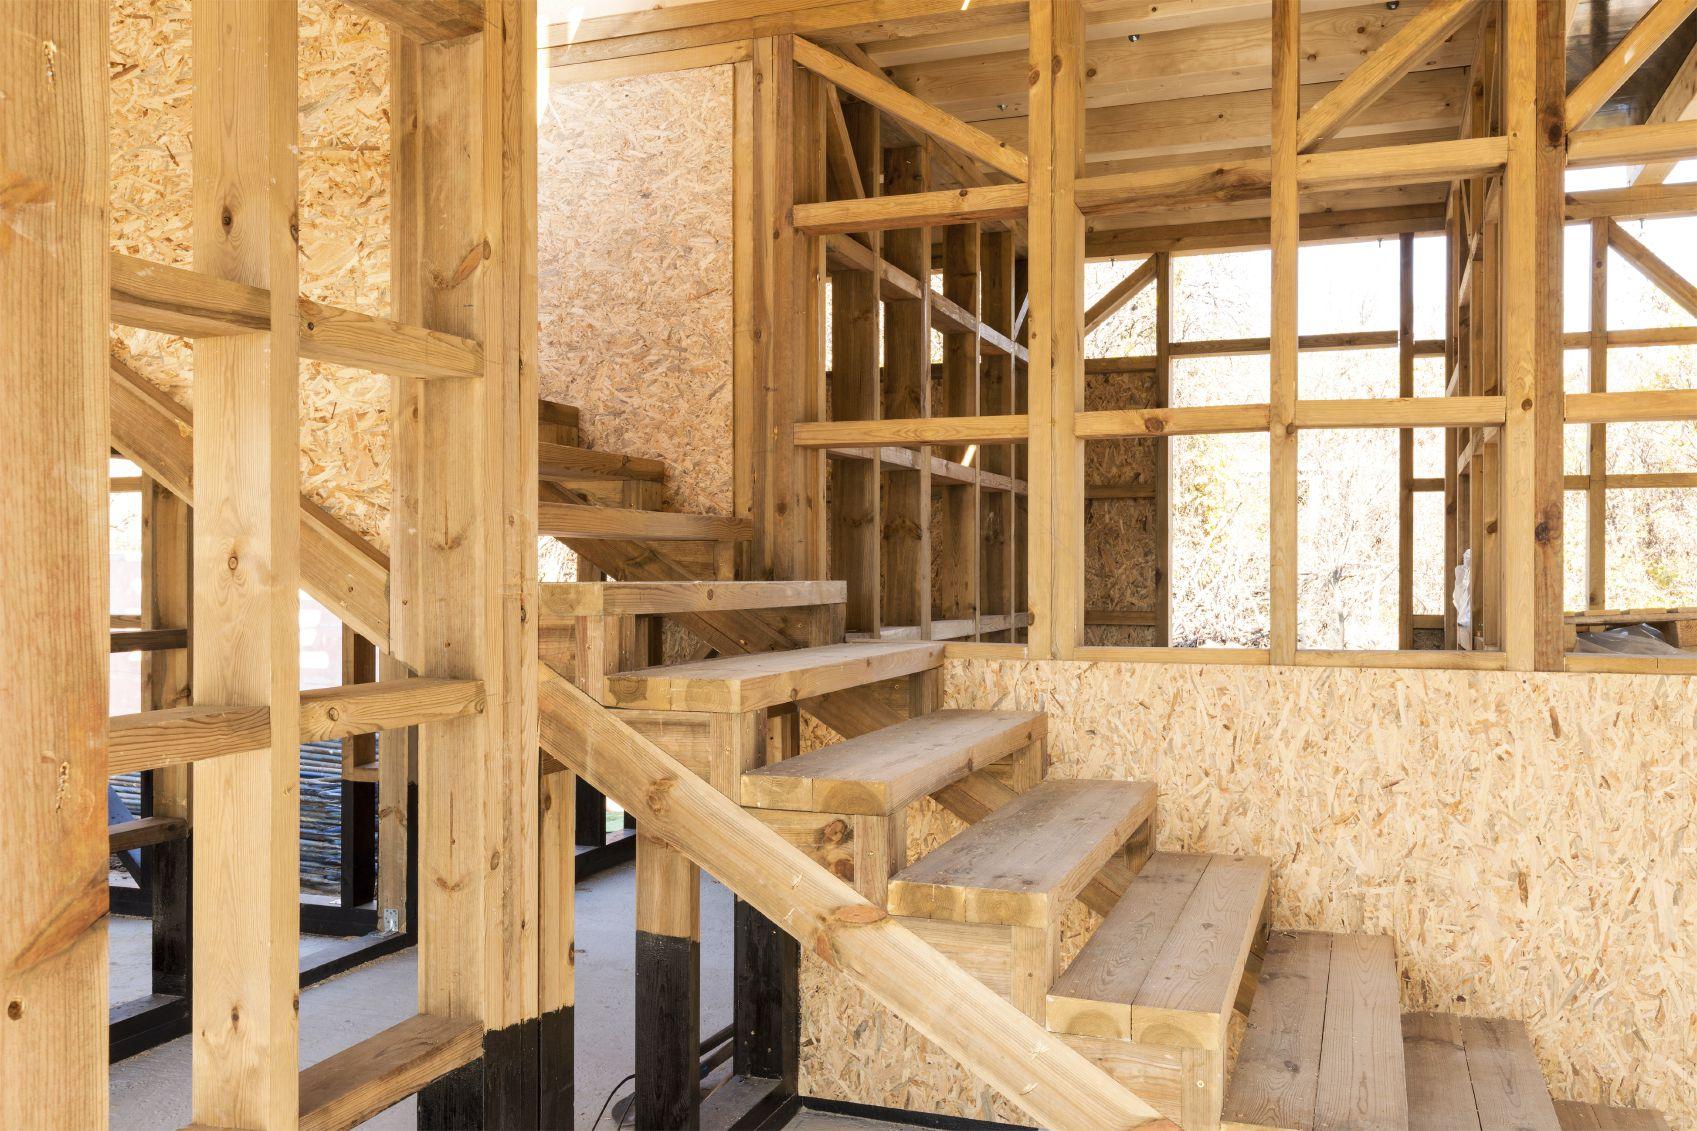 Construction Loan Definition